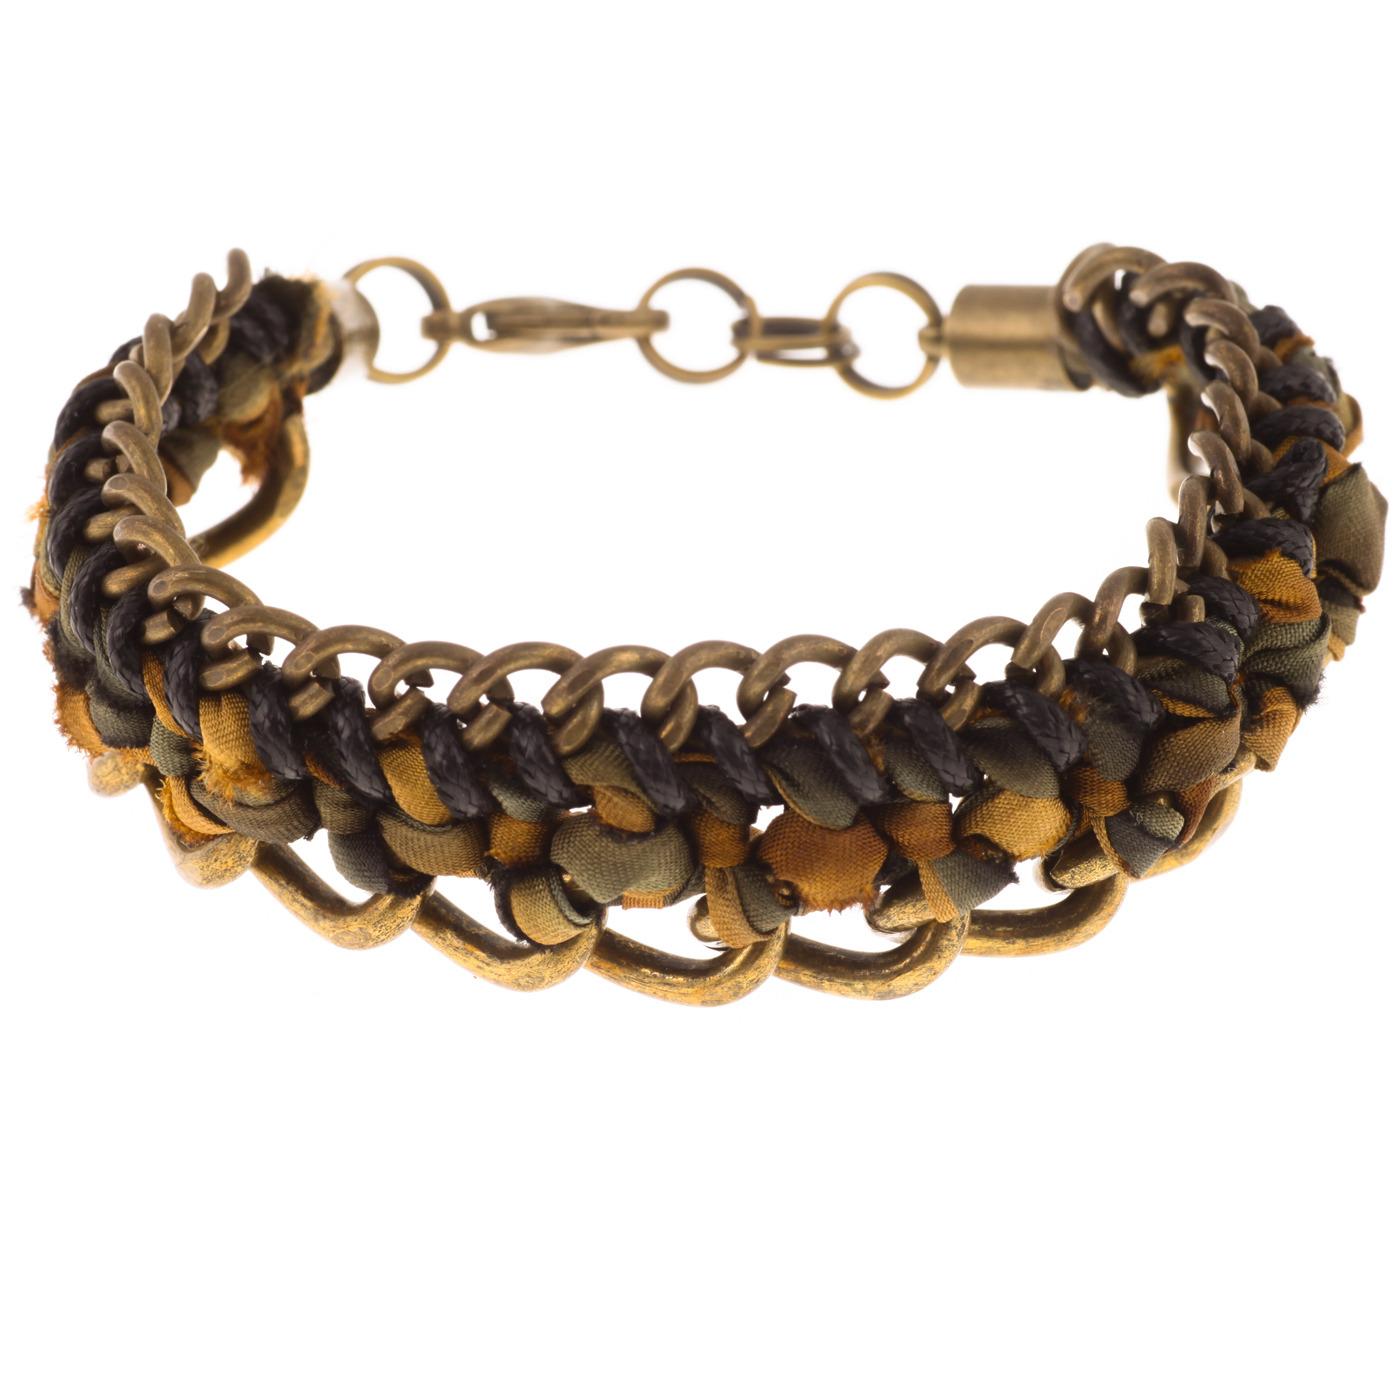 Artisan, Eco-Friendly, Designer Linked In Bracelet